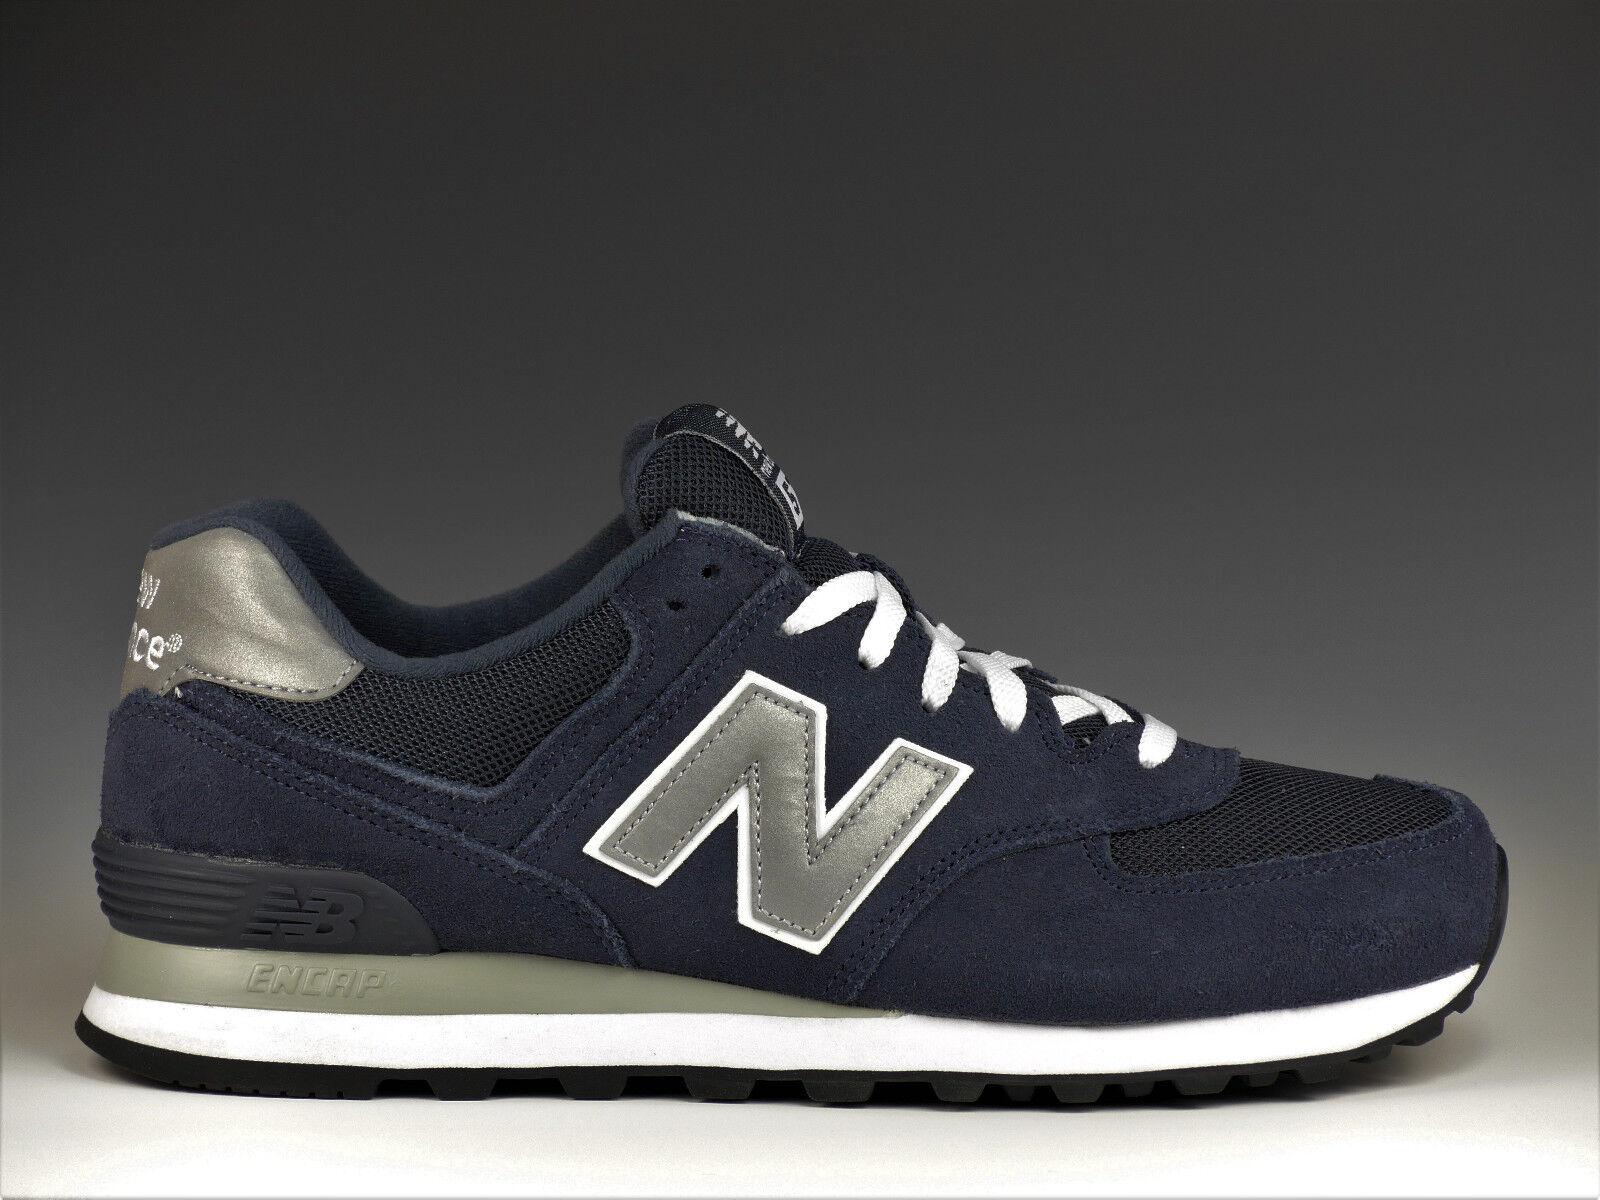 NUEVA Balance M 574 574 574 Hombre Azul Marino Zapatos zapatillas m574nn NUEVO e5853f